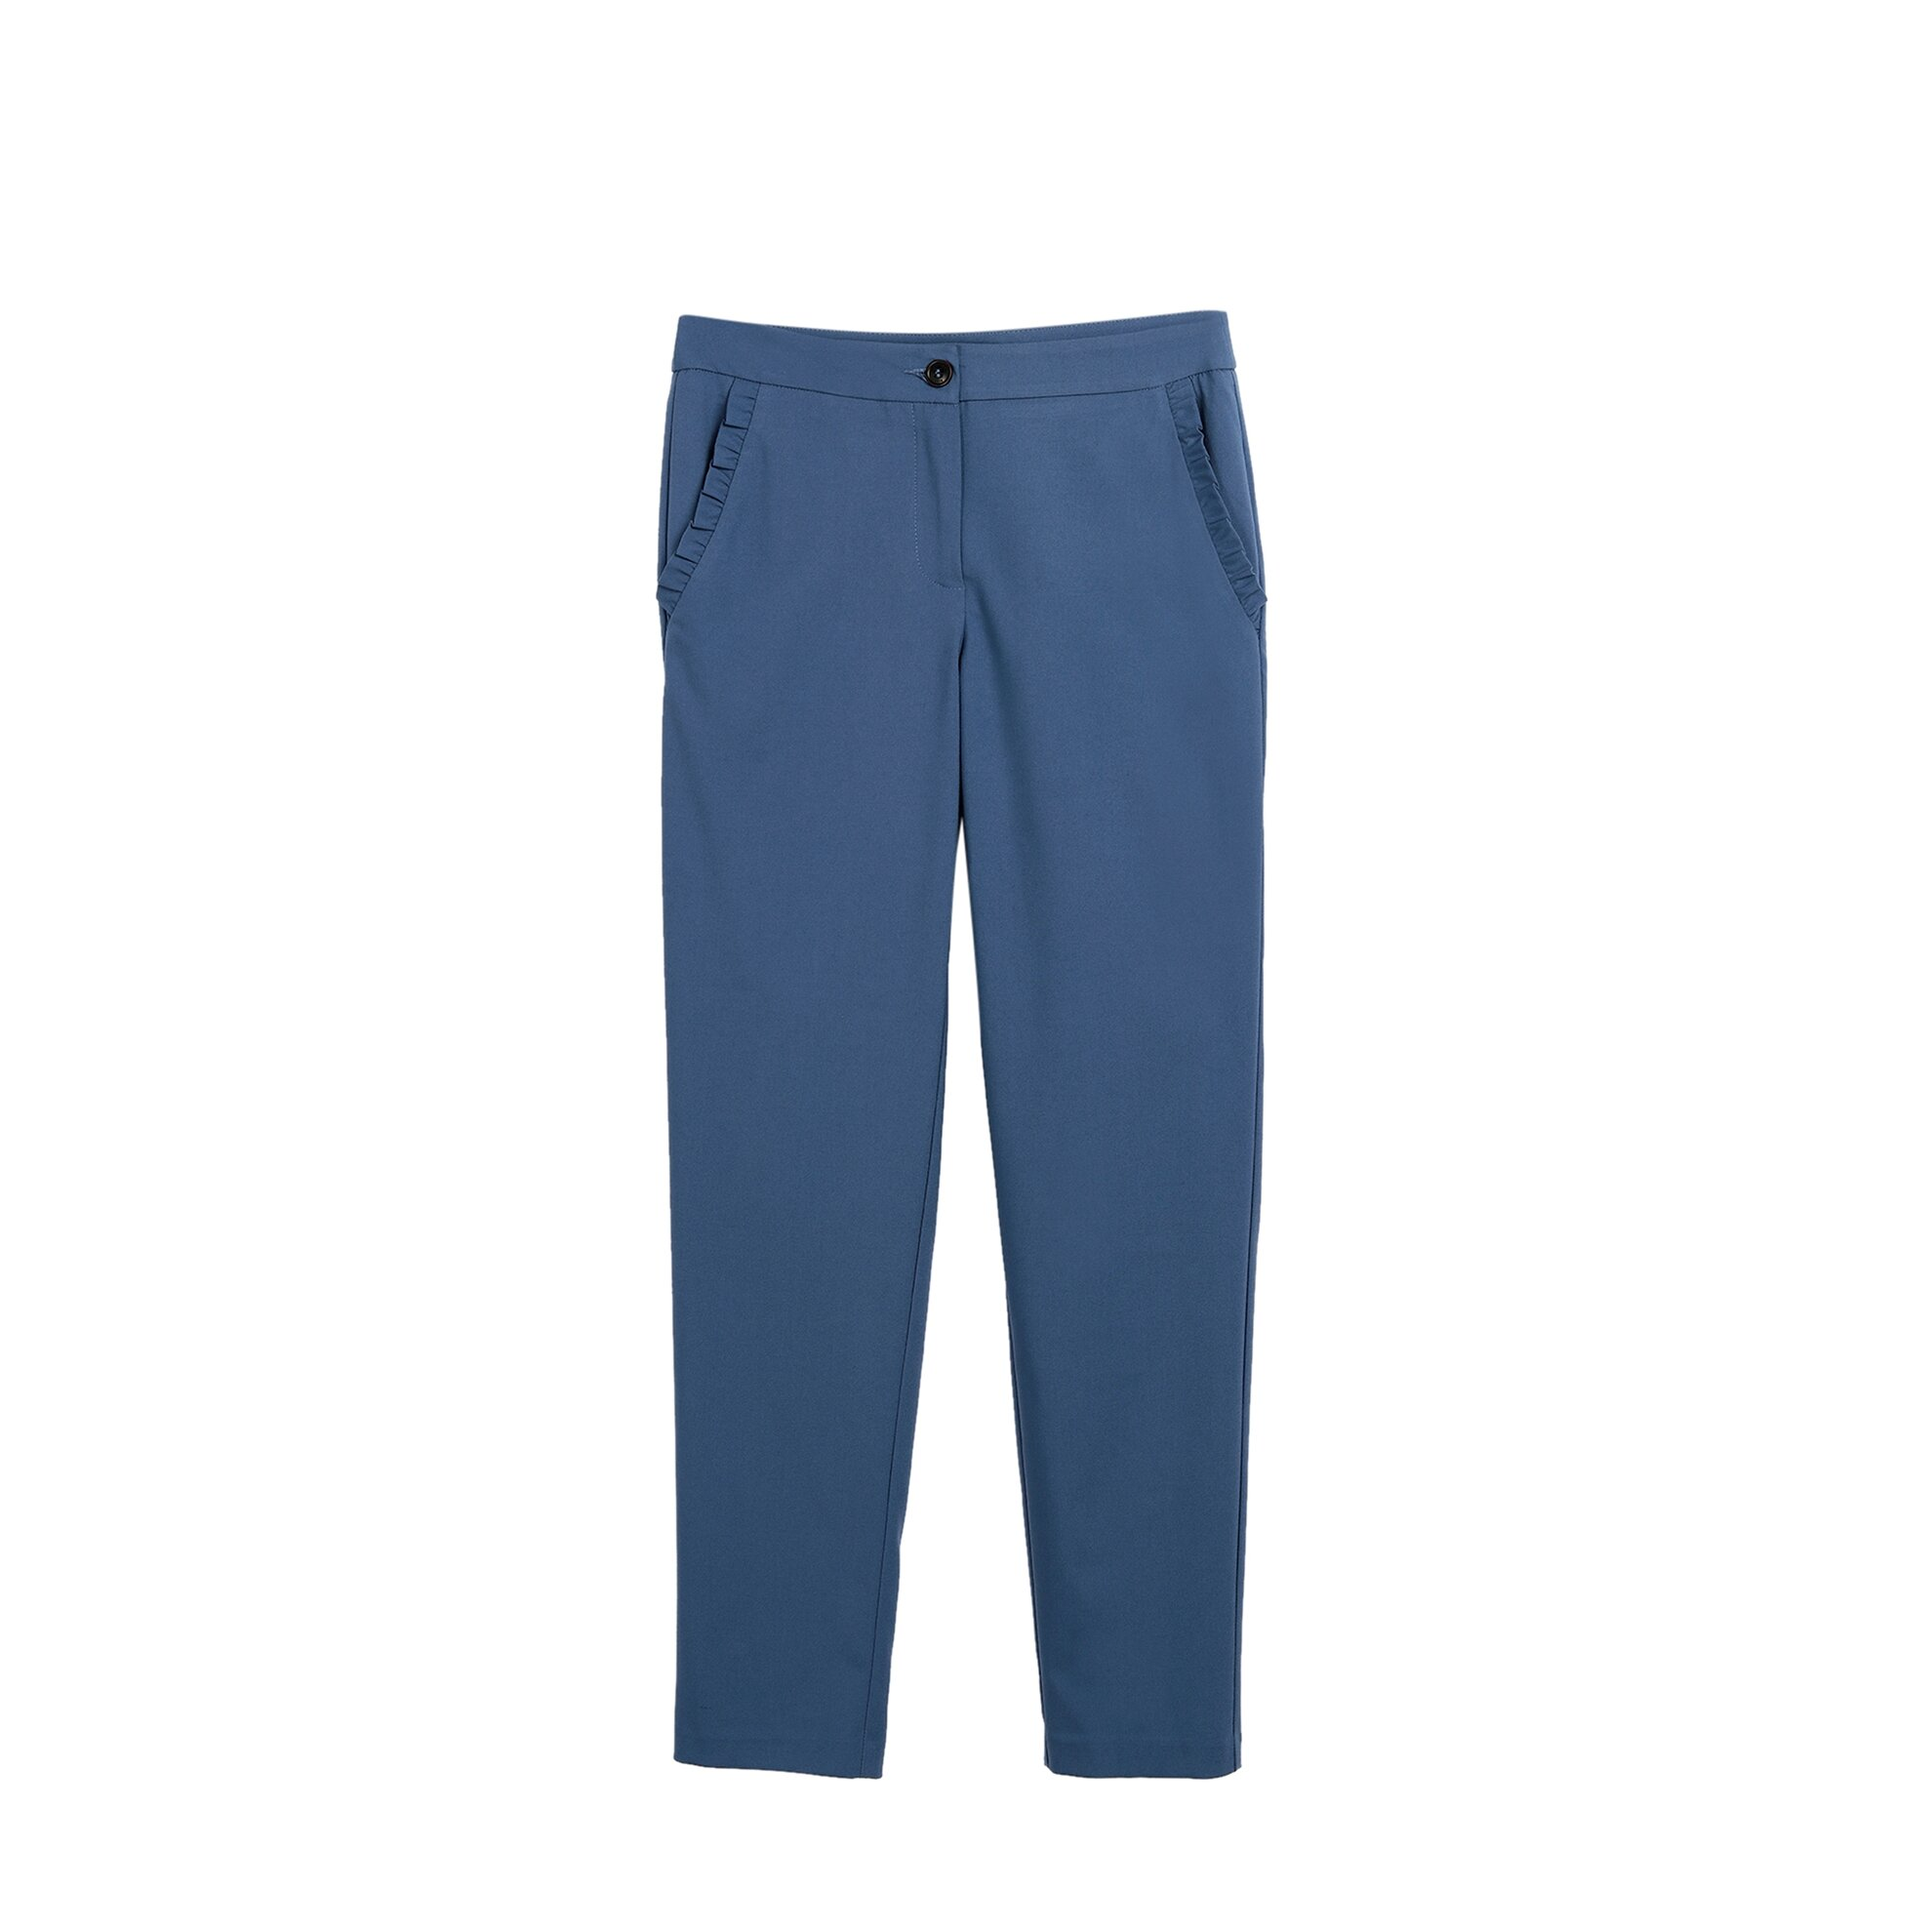 Cebi Büzgü Detaylı Pantolon